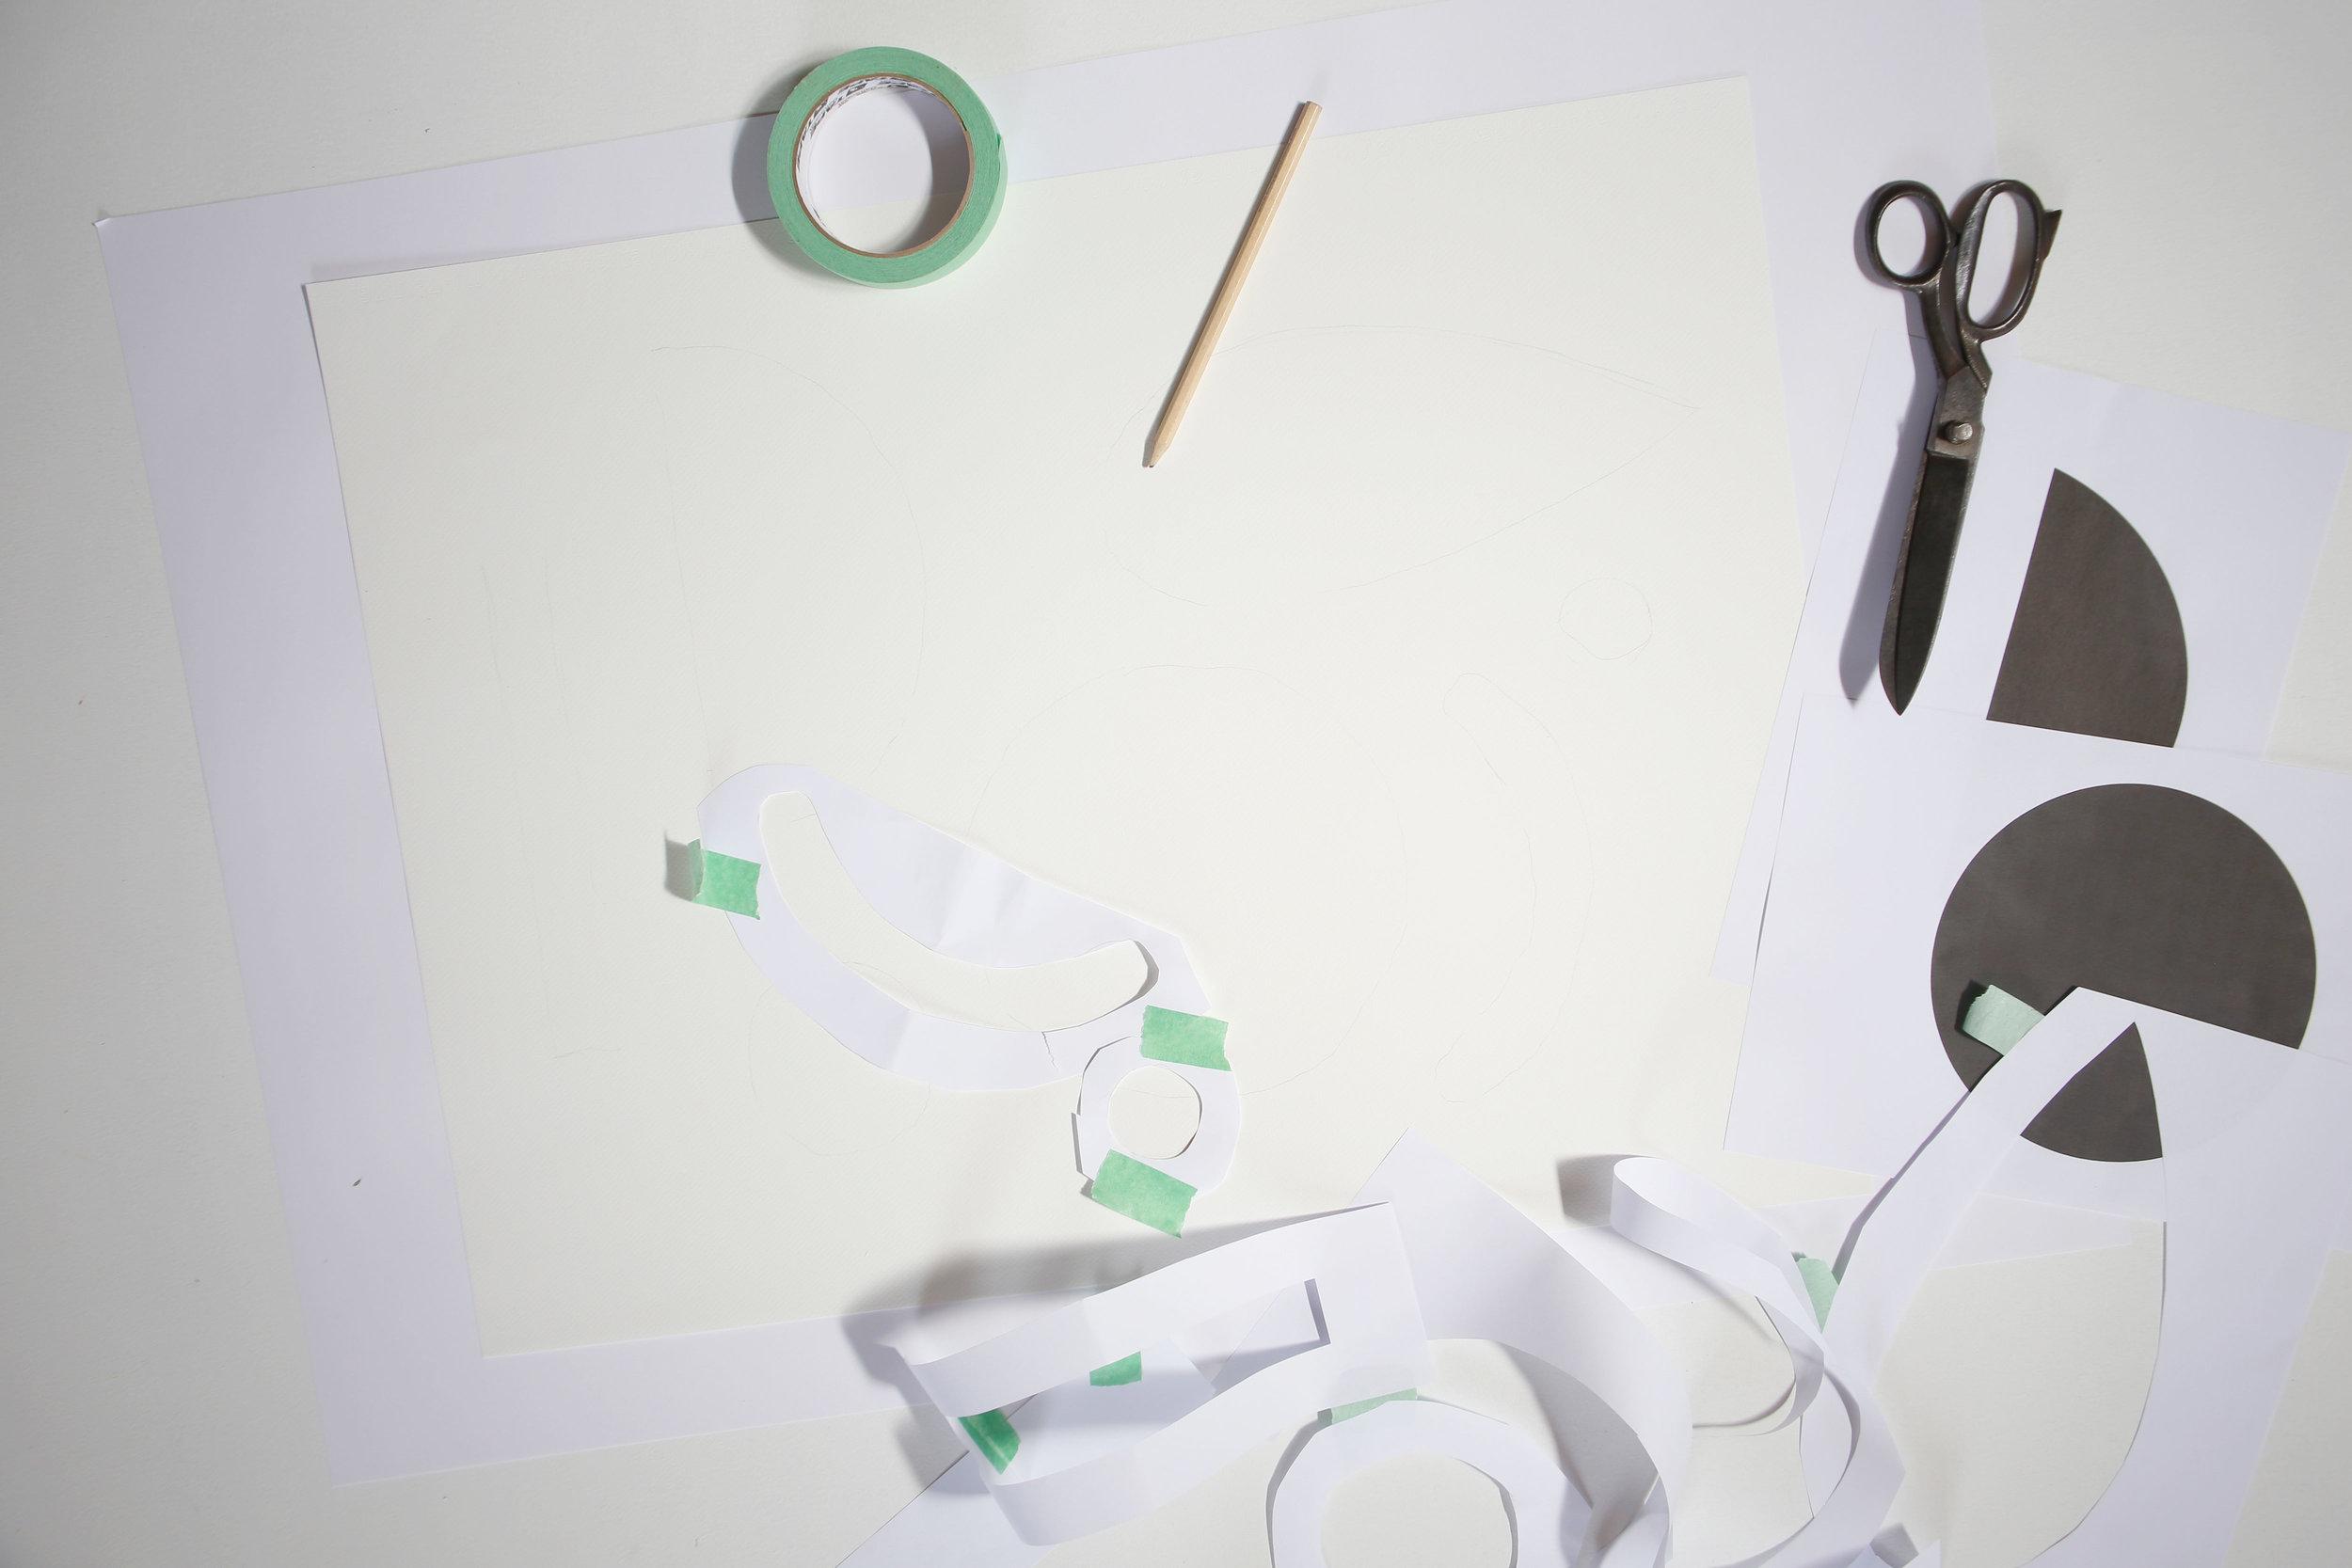 Resene-AbstractArt-DIY-Trace.jpg